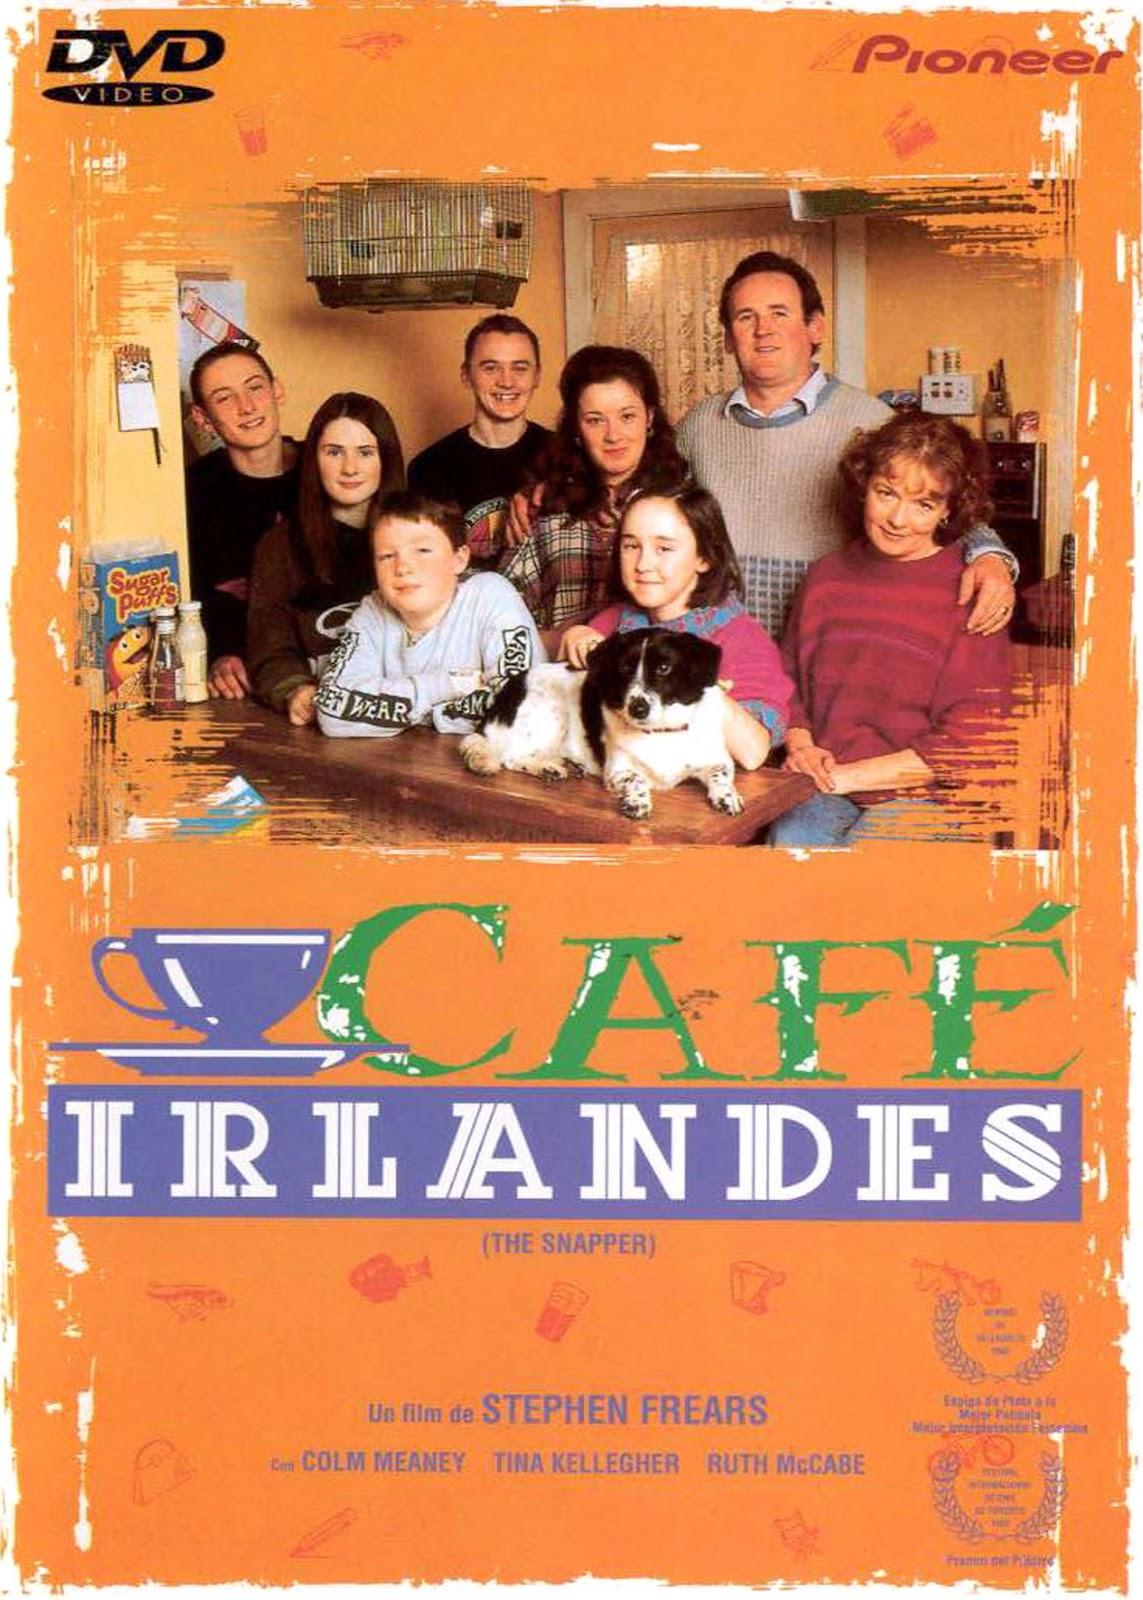 Café irlandés (1993) Comedia